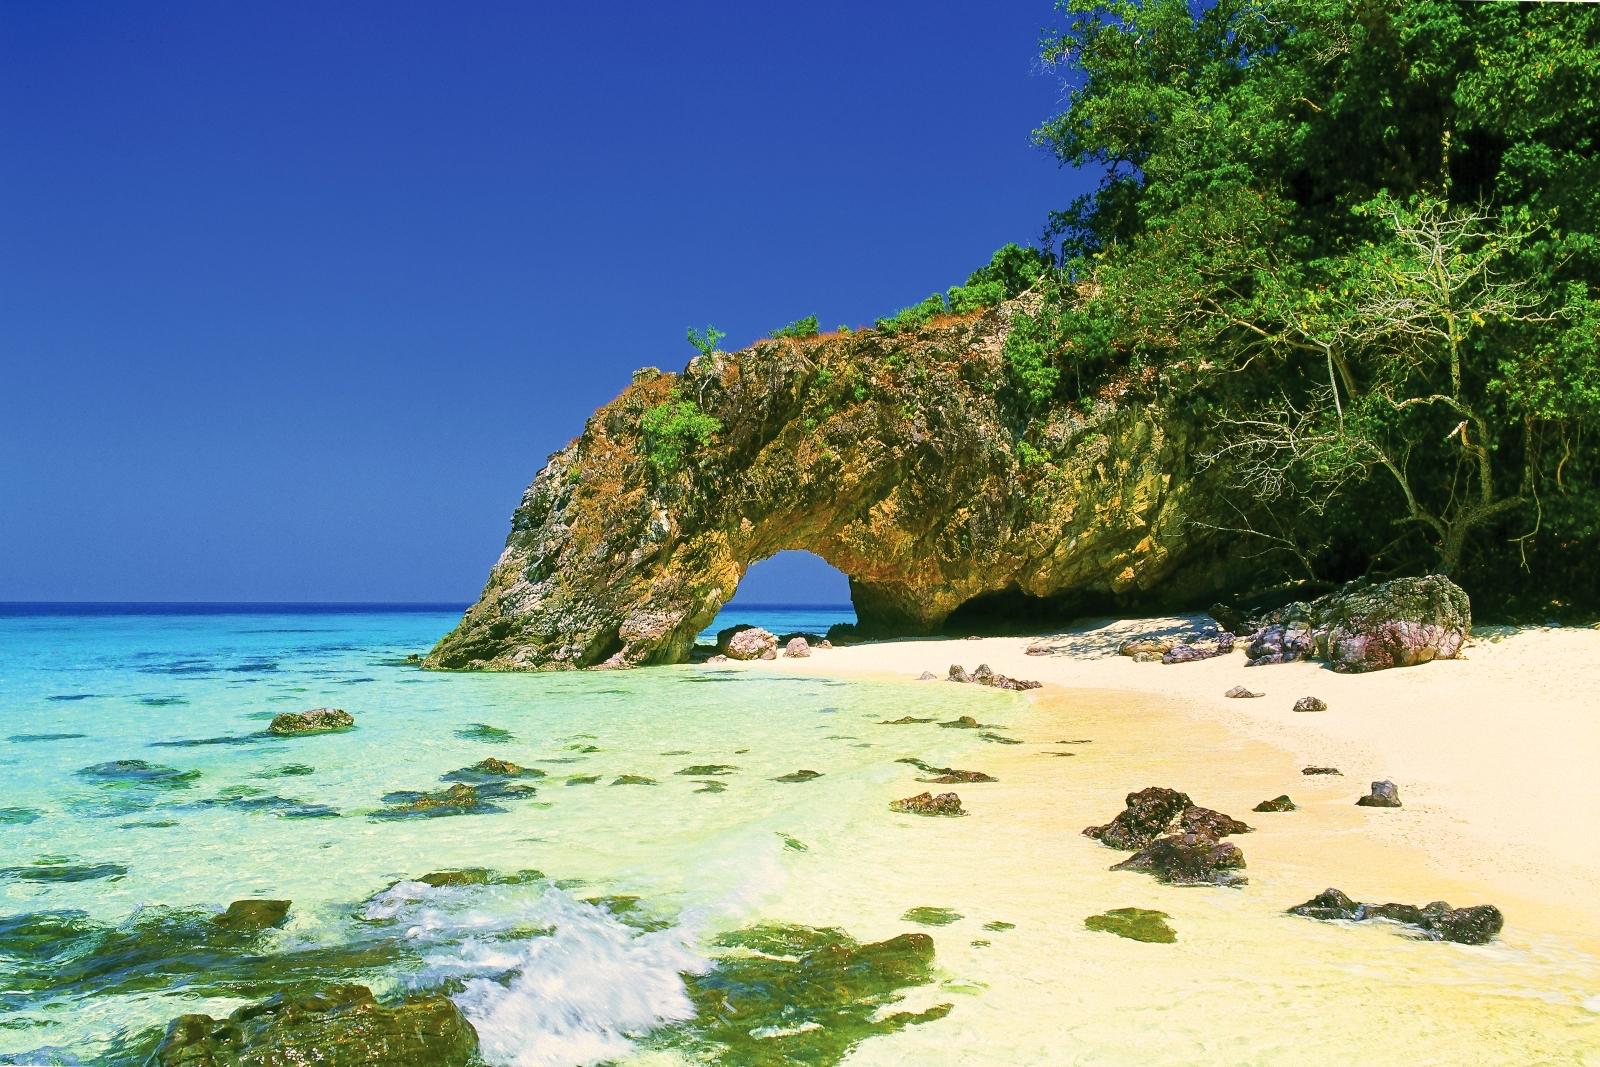 Khai Island is located inTarutao National Marine Park, Satun